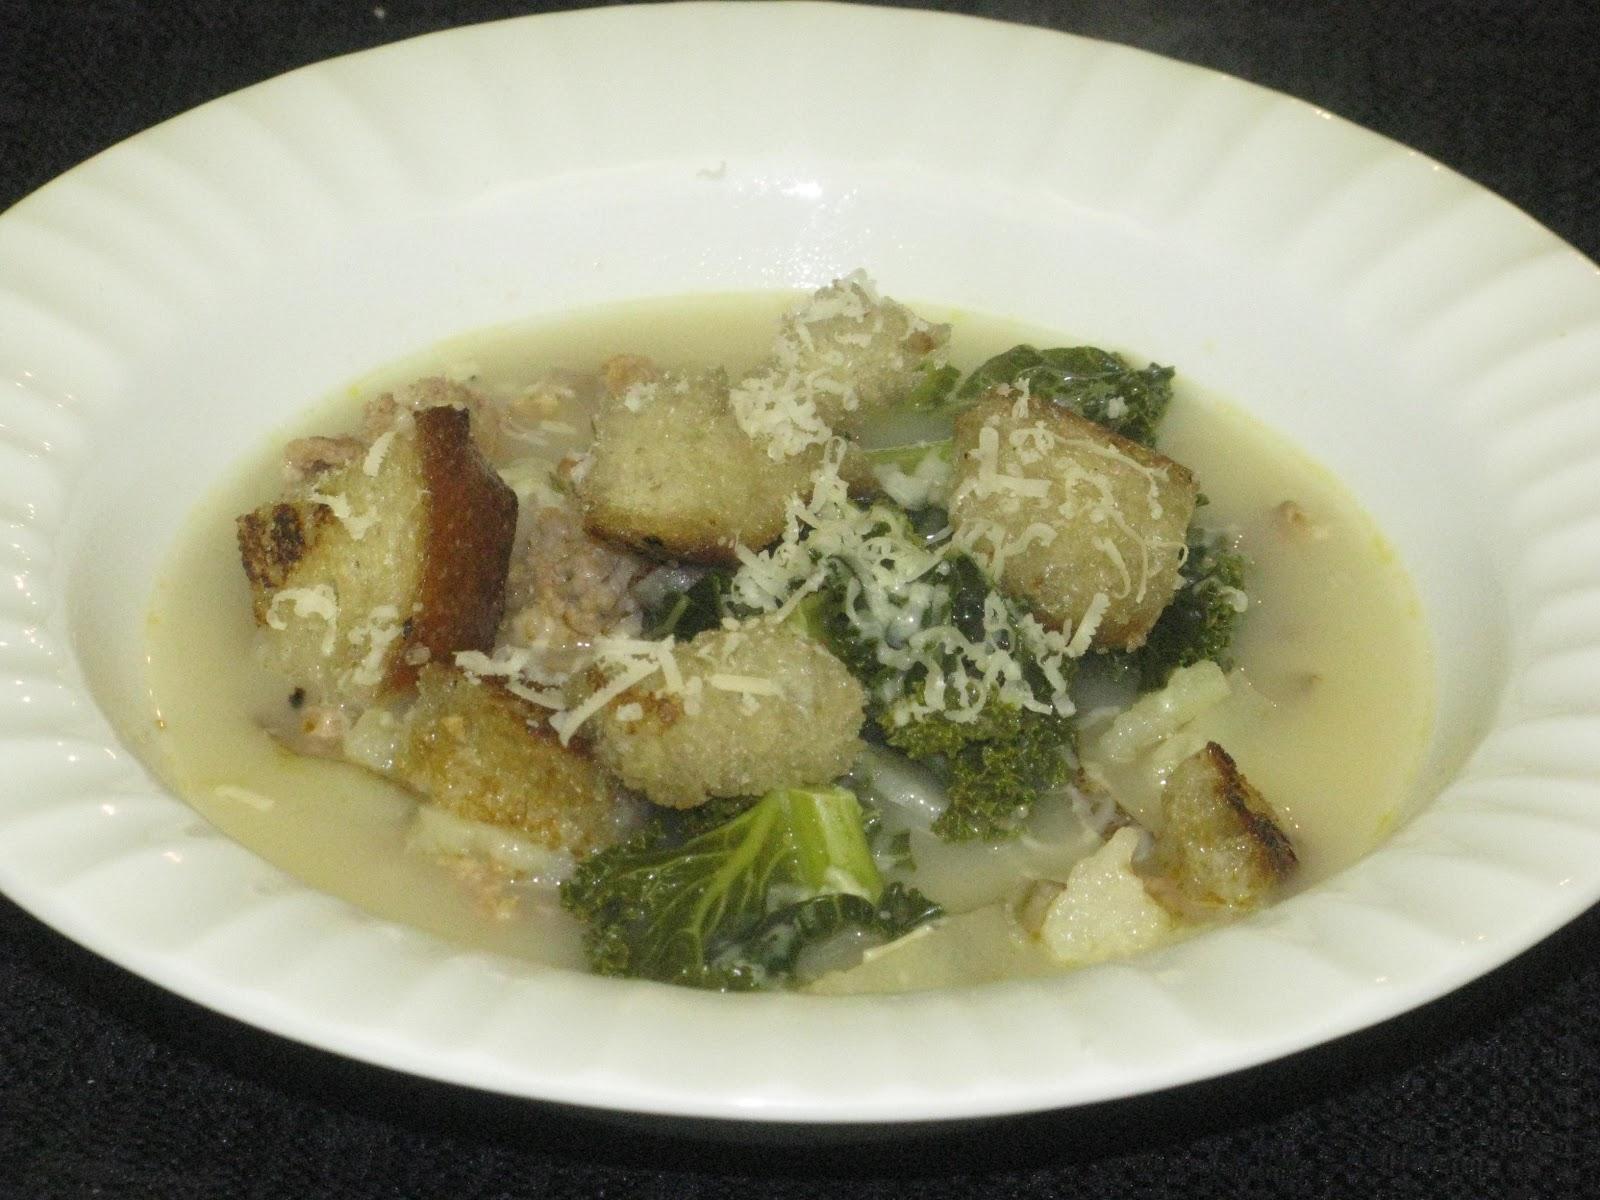 Shamrocks and Shenanigans: Zuppa Toscana Soup